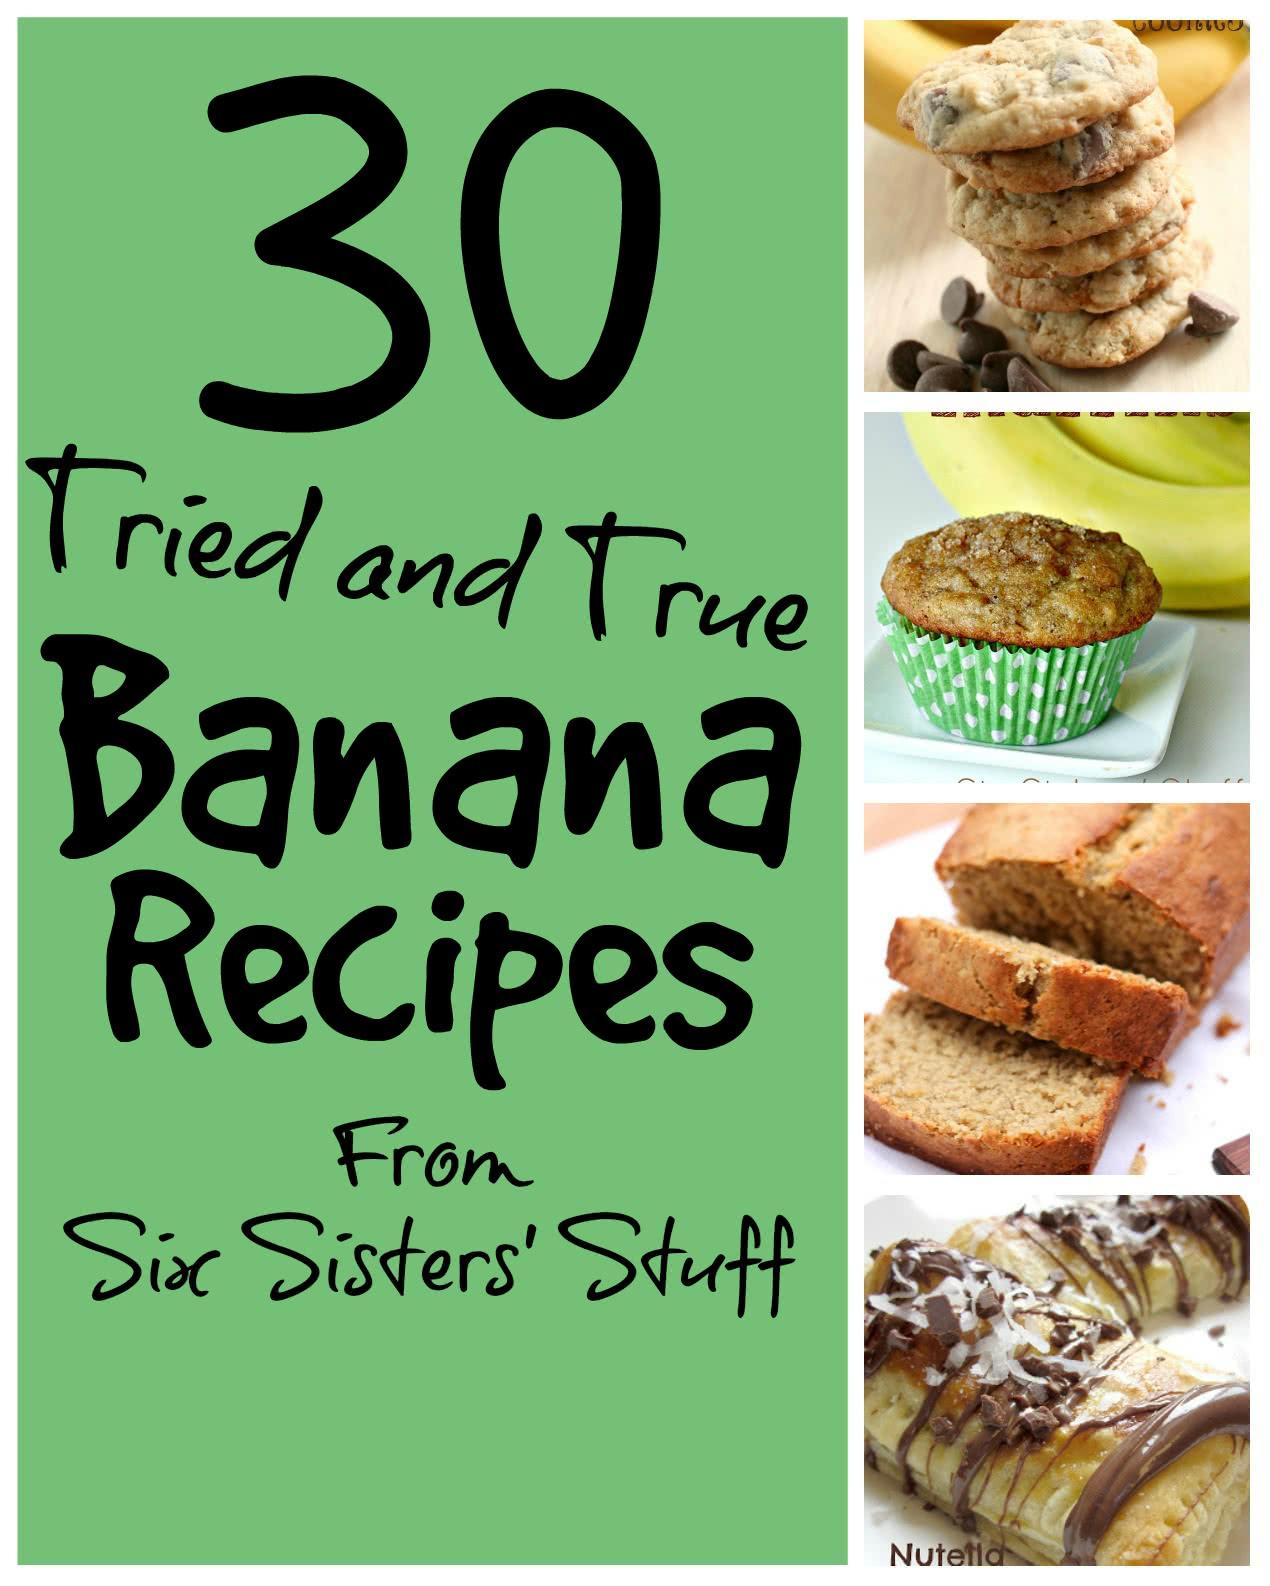 30 Tried and True Banana Recipes